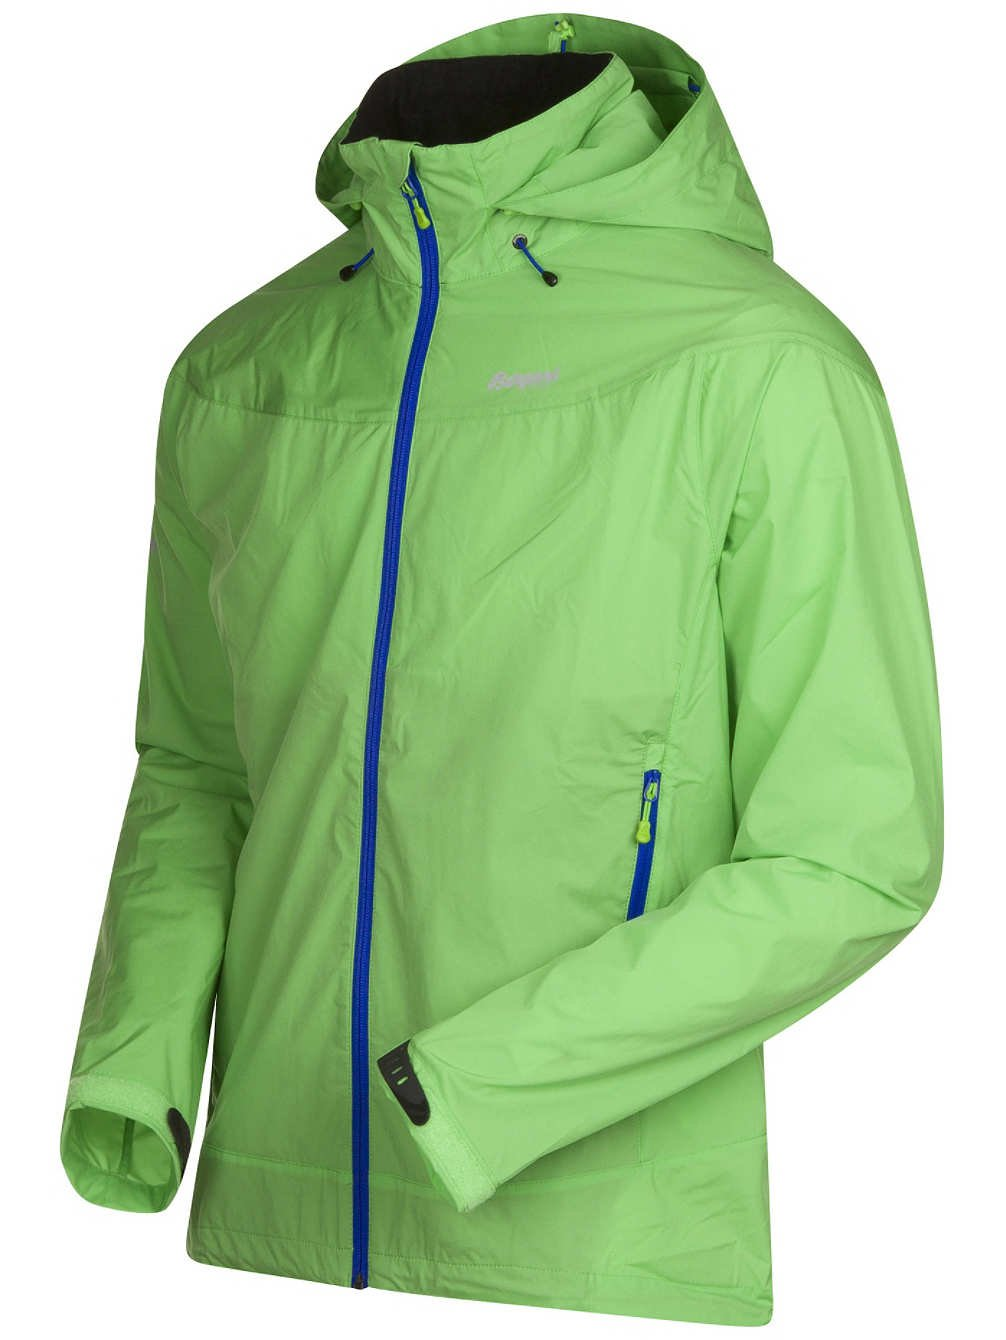 Bergans Microlight Men's Jacket